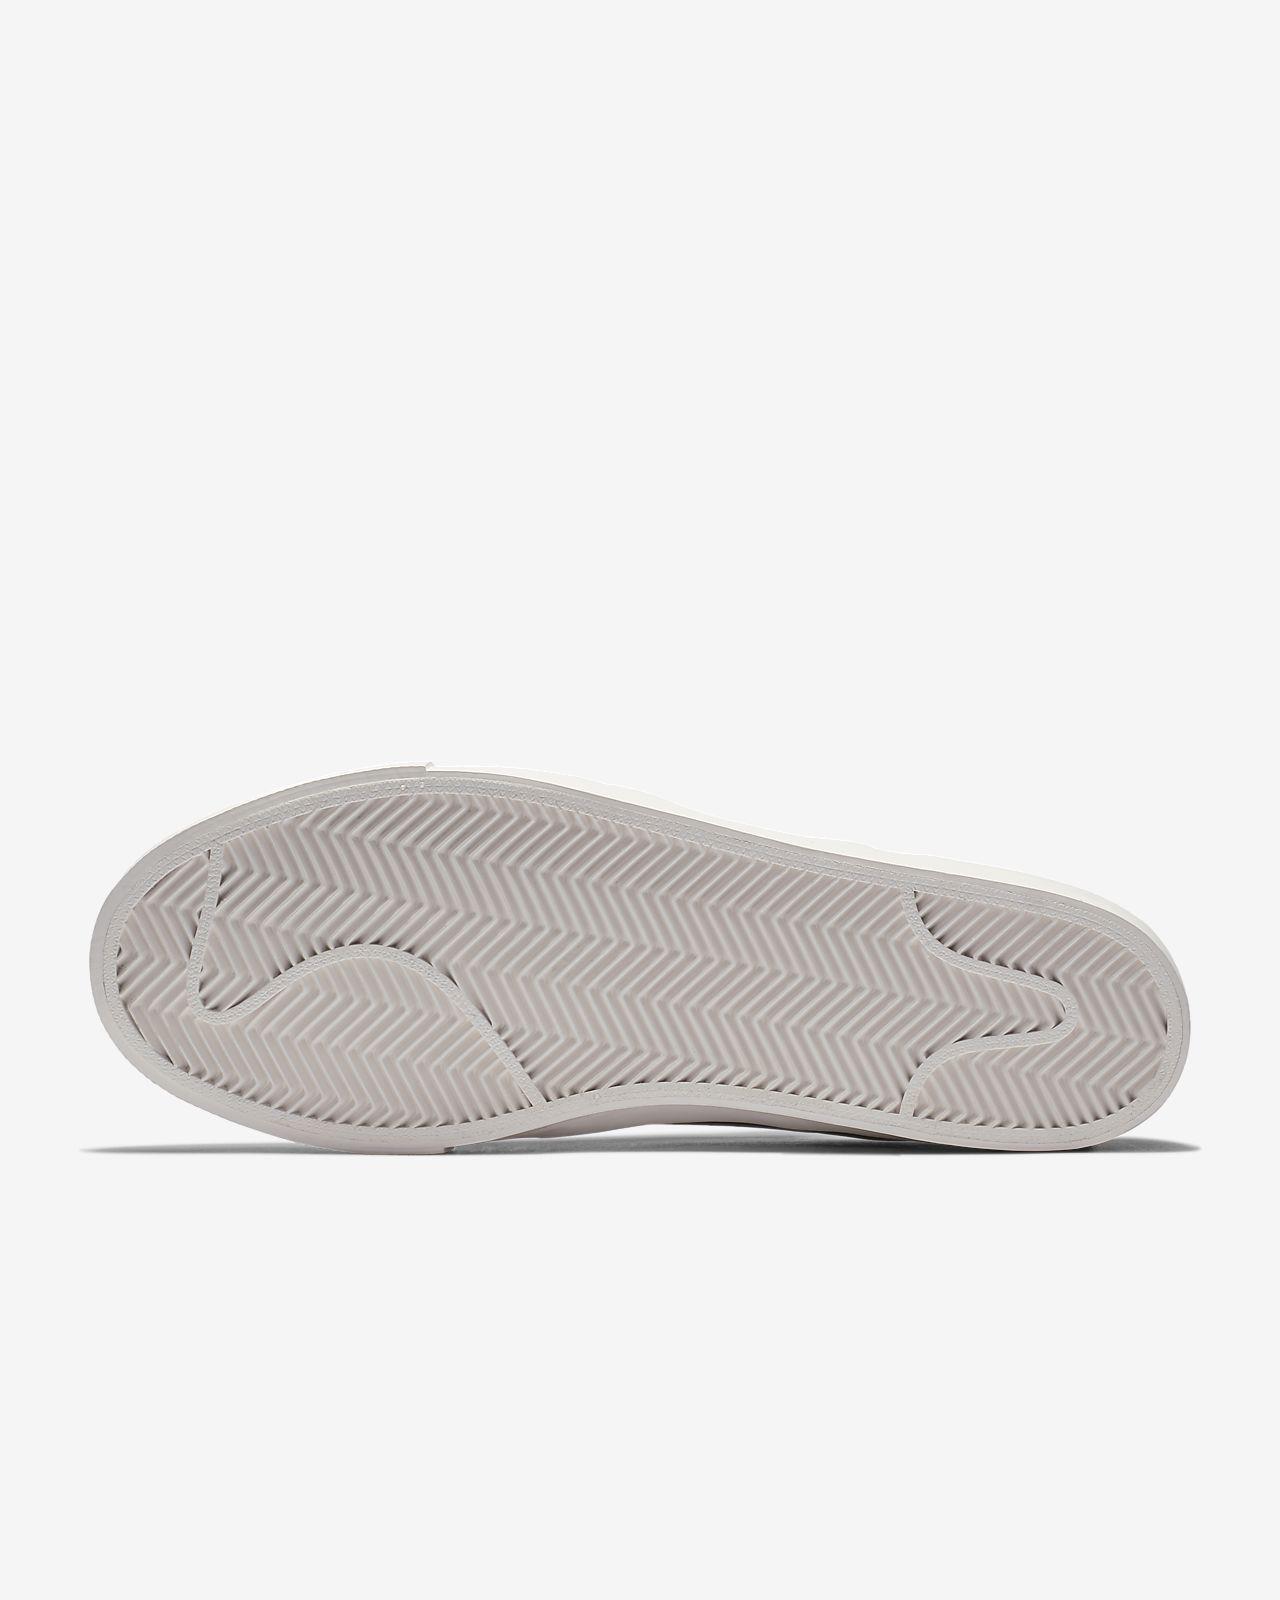 070f4038ce6b Nike SB Zoom Janoski HT Slip Premium Men s Skate Shoe. Nike.com